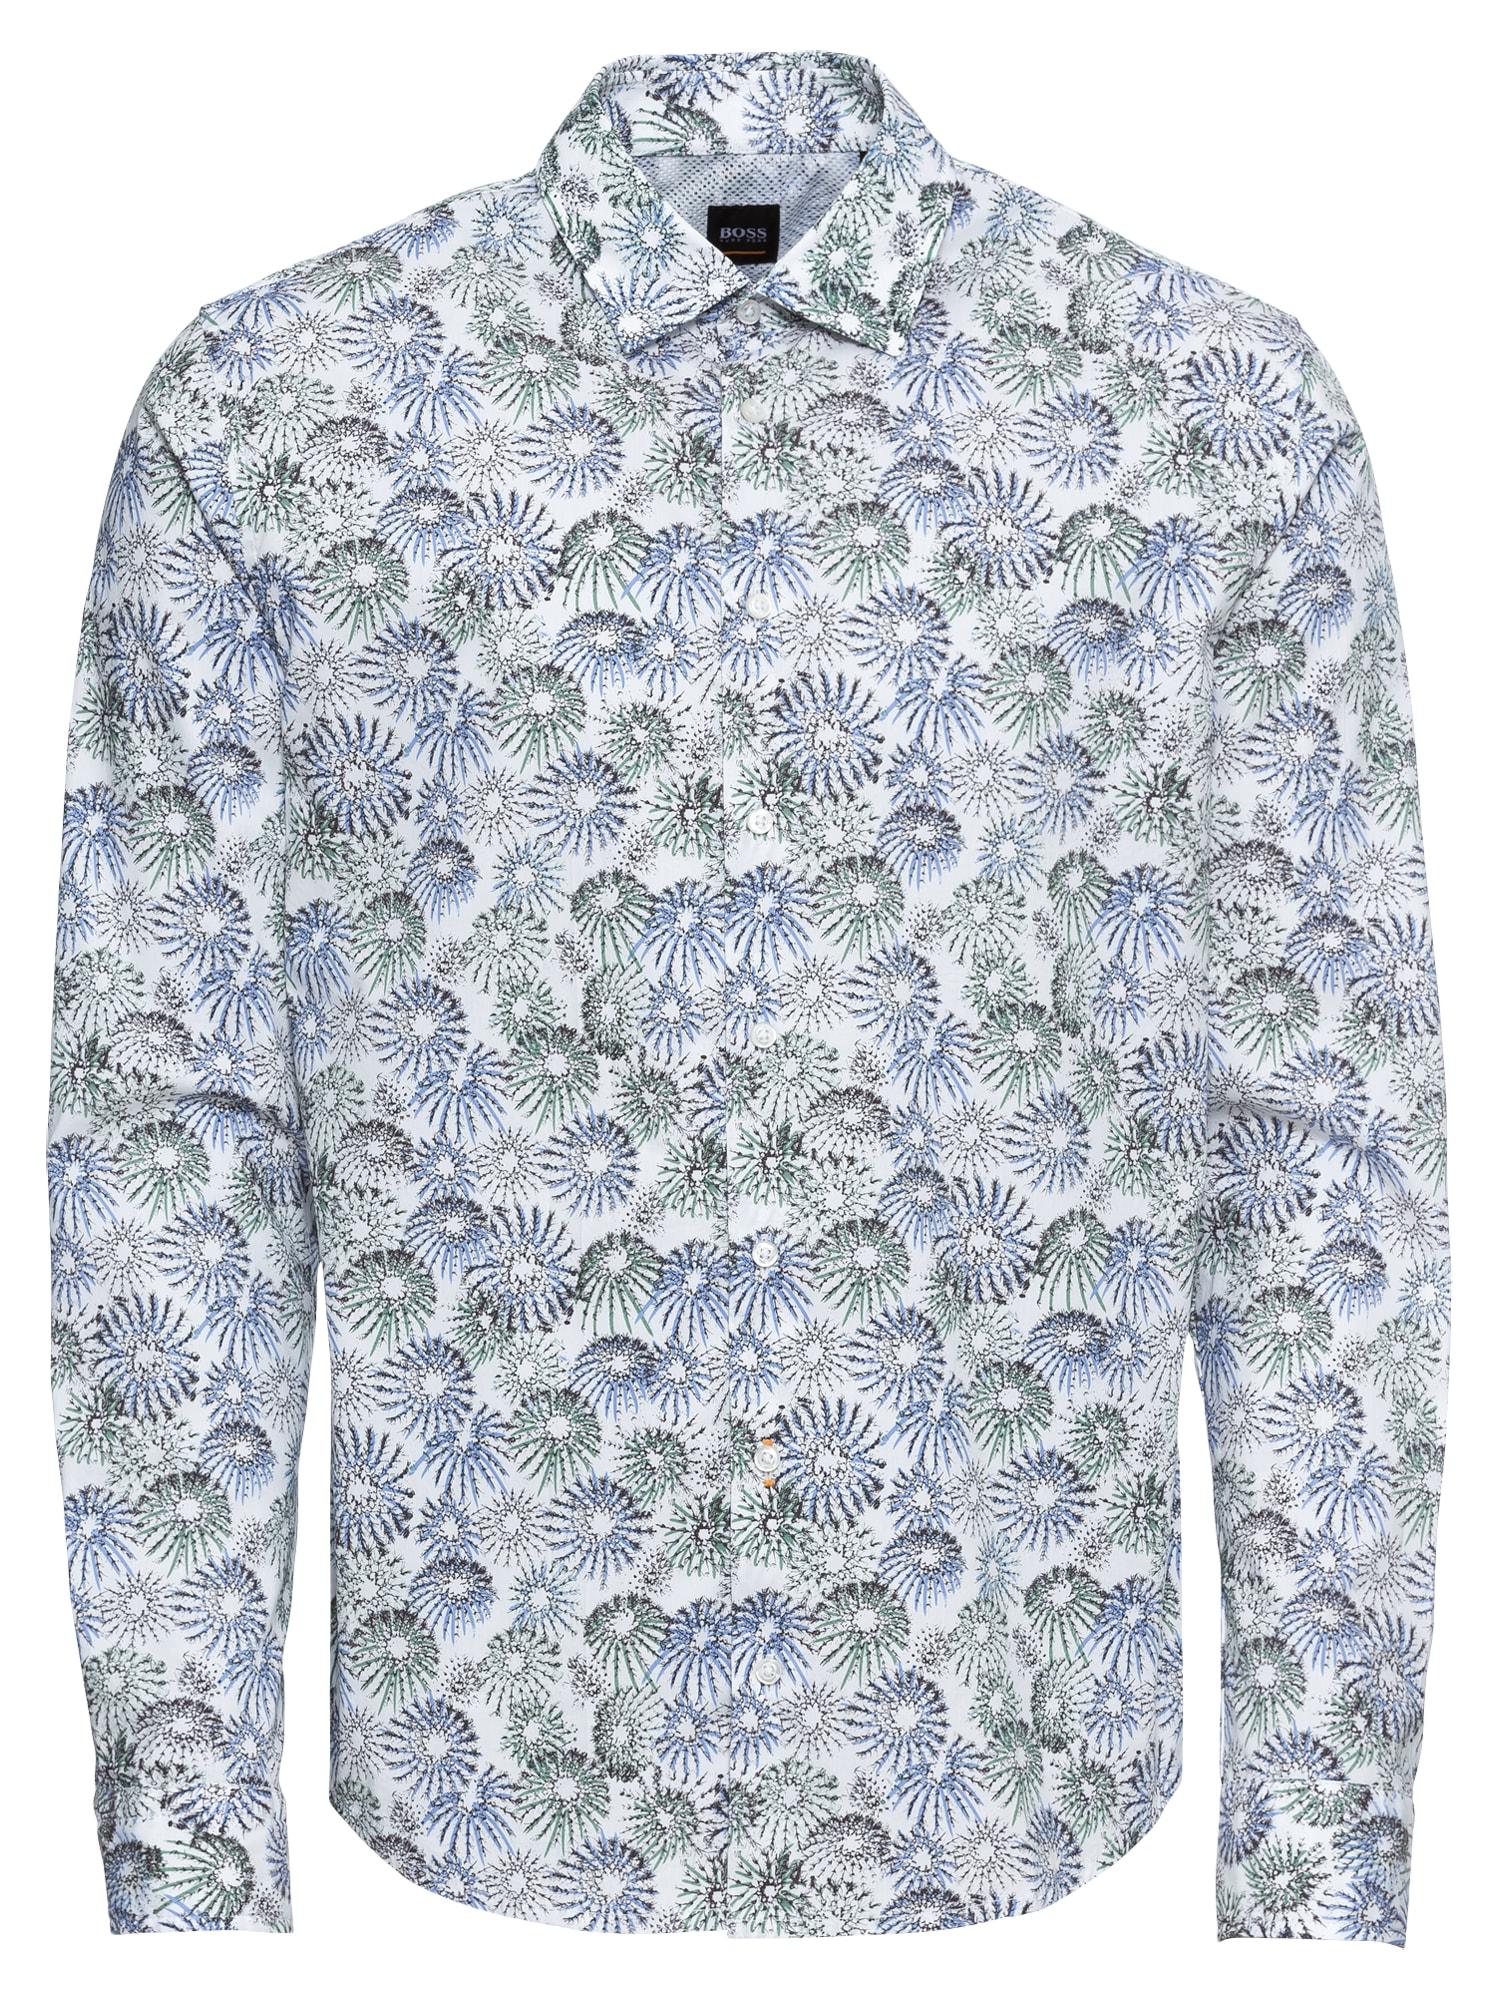 Košile Mypop_1 10214140 01 modrá bílá BOSS